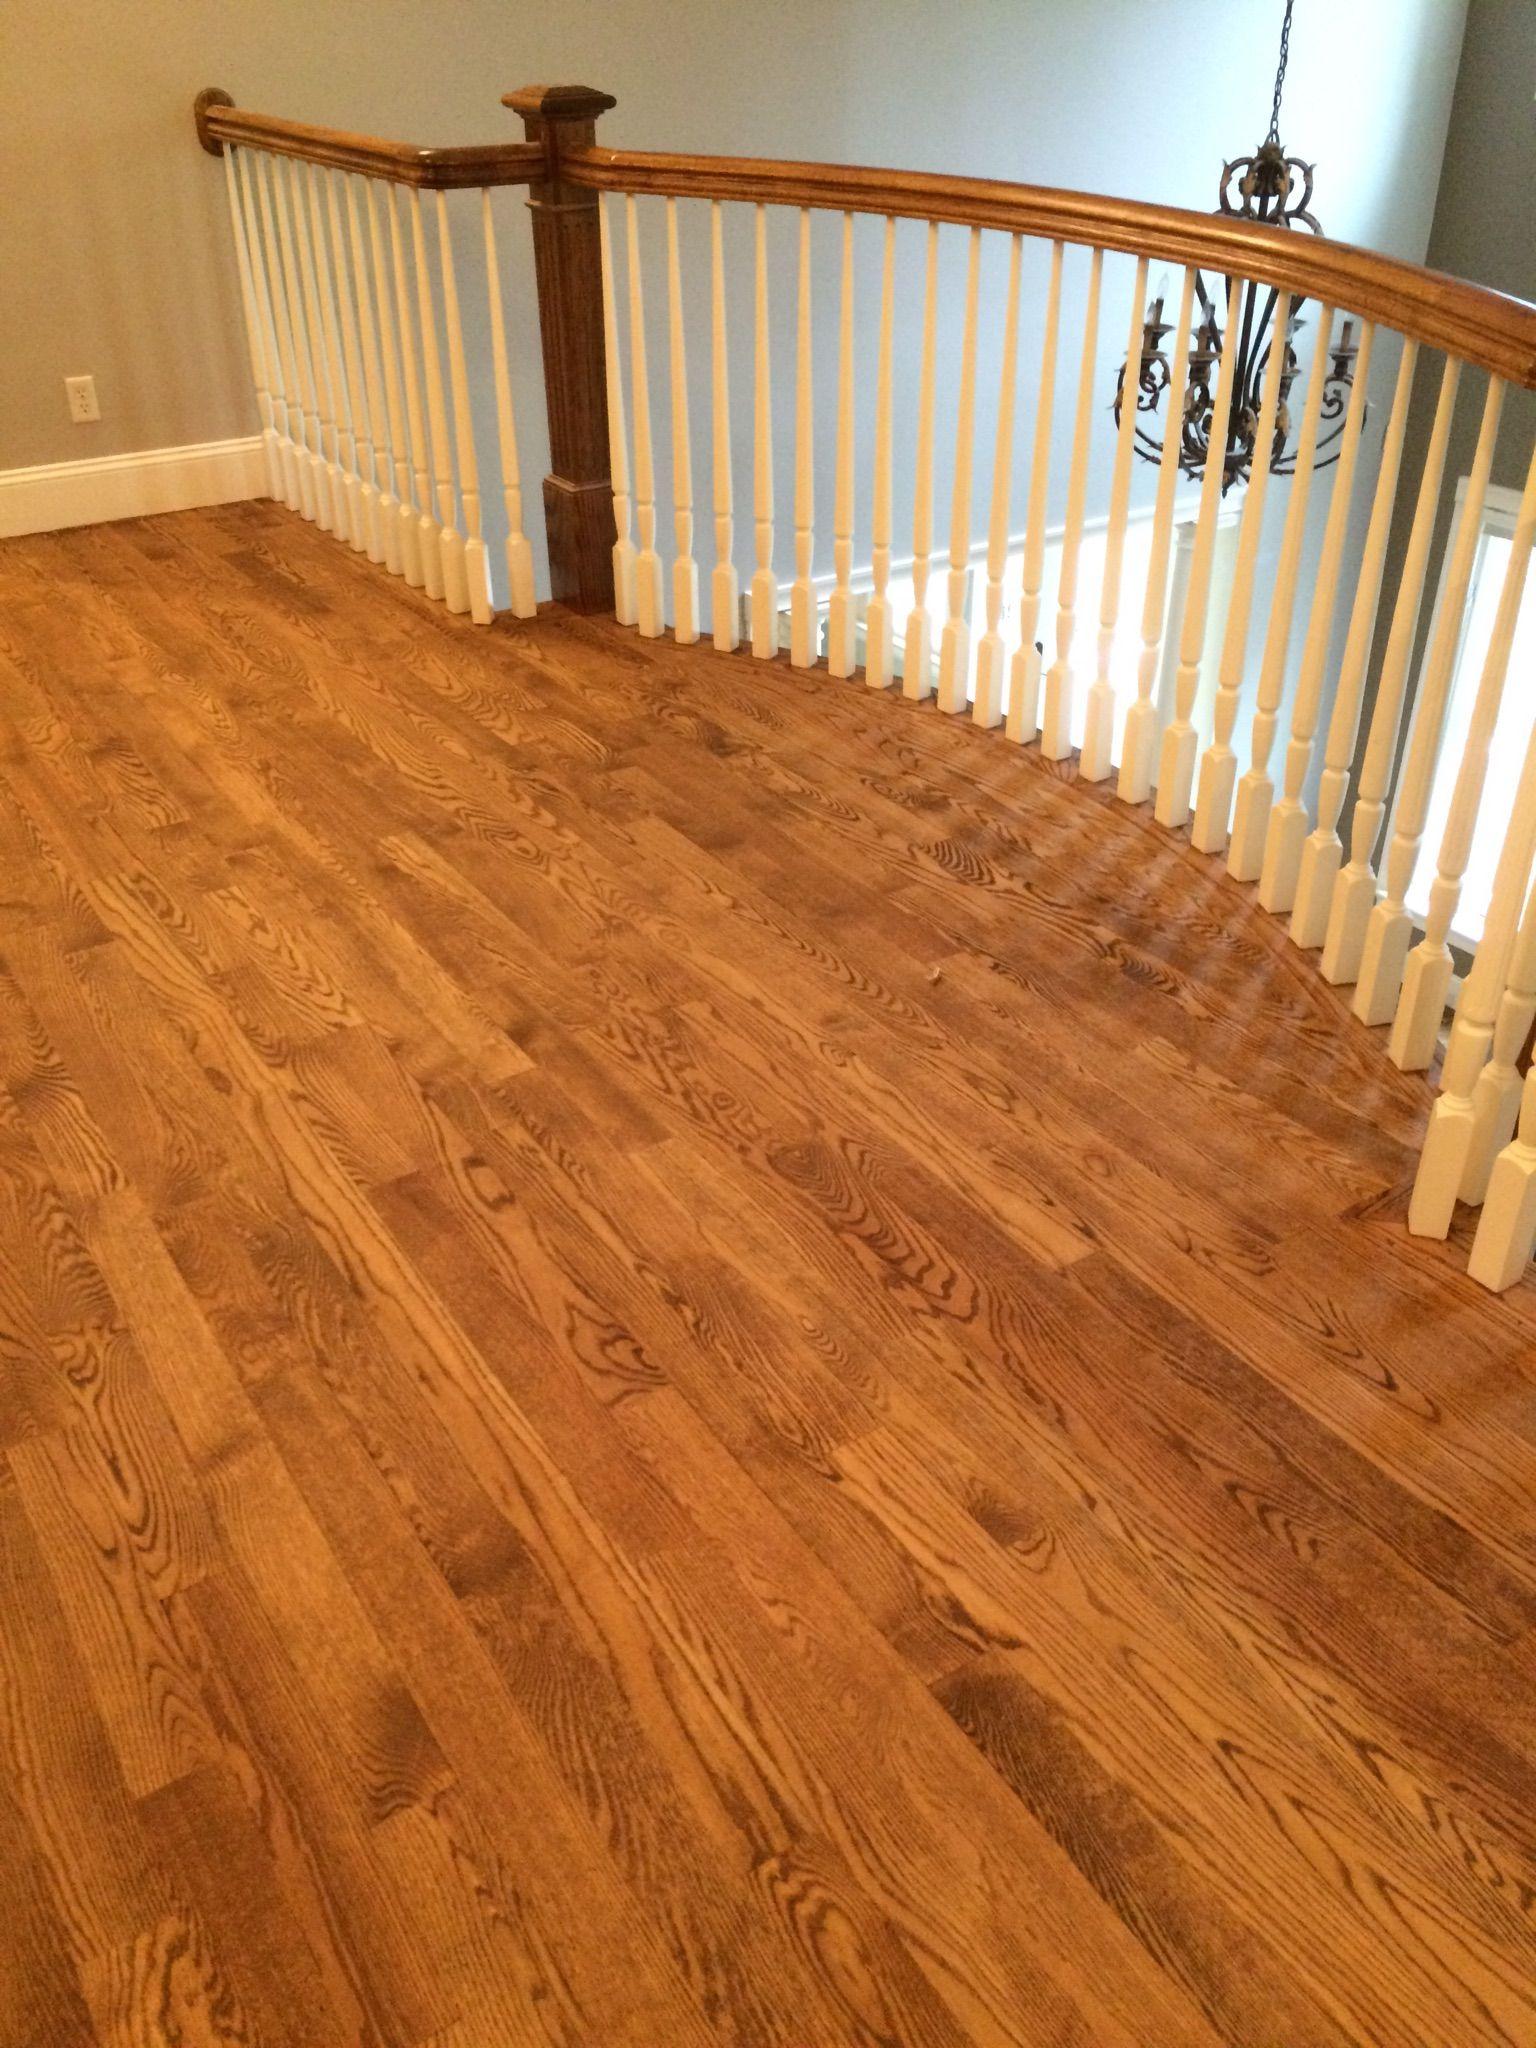 Resanded Some Beautiful Red Oak Hardwood Floors